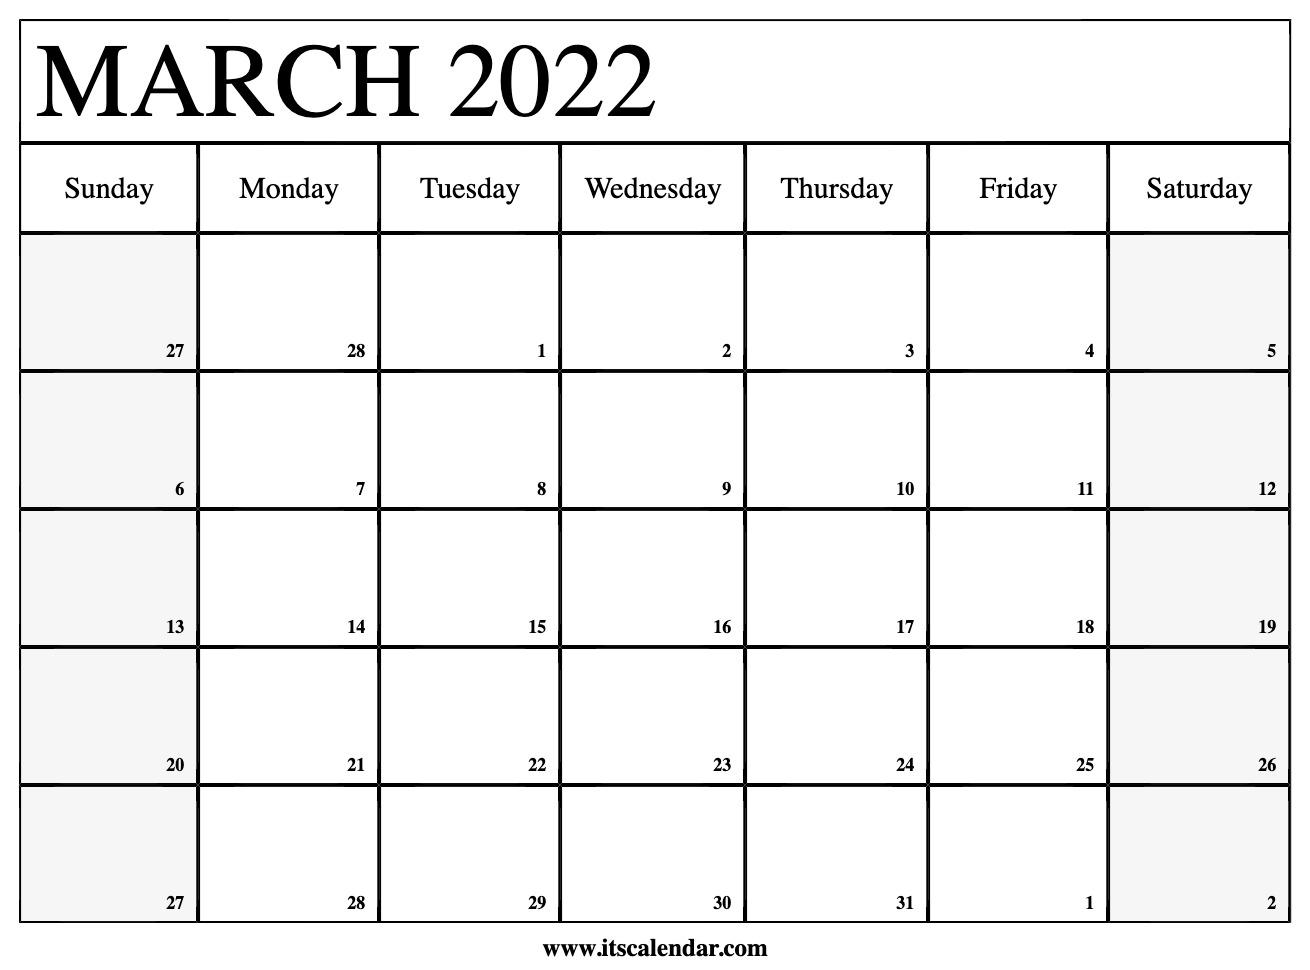 Calendar Template March 2022.Free Printable March 2022 Calendar